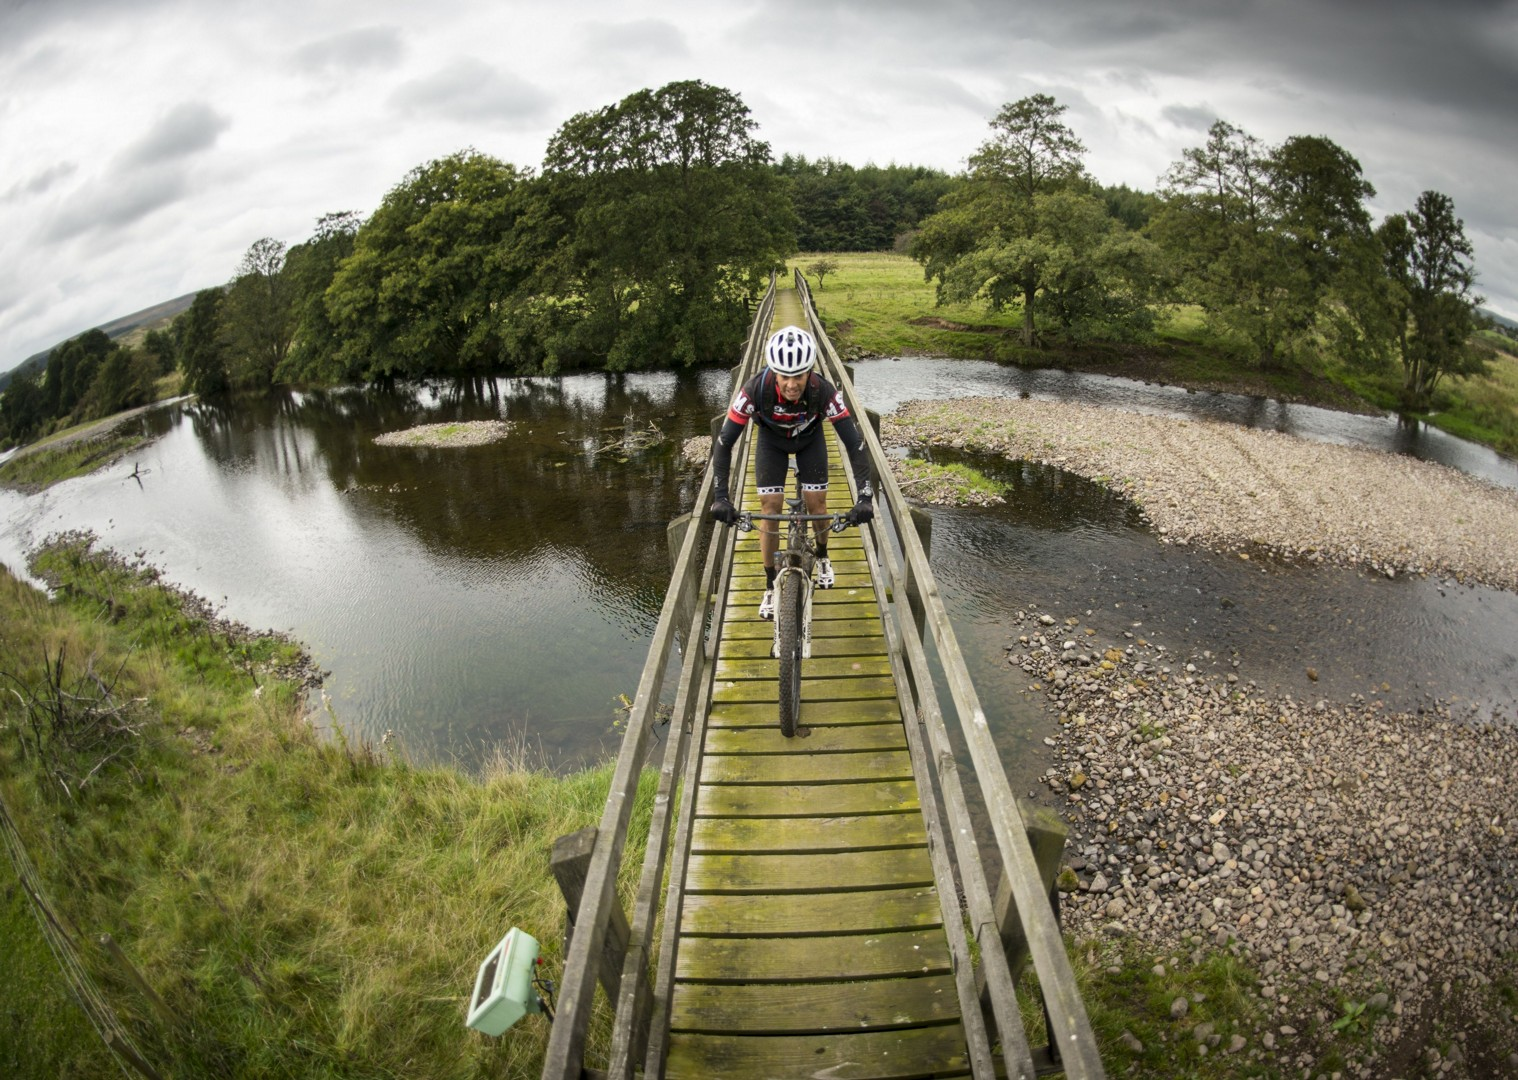 sandstone-way-rothwell-200.jpg - UK - Northumberland - Sandstone Way - Self-Guided Mountain Bike Weekend - Mountain Biking